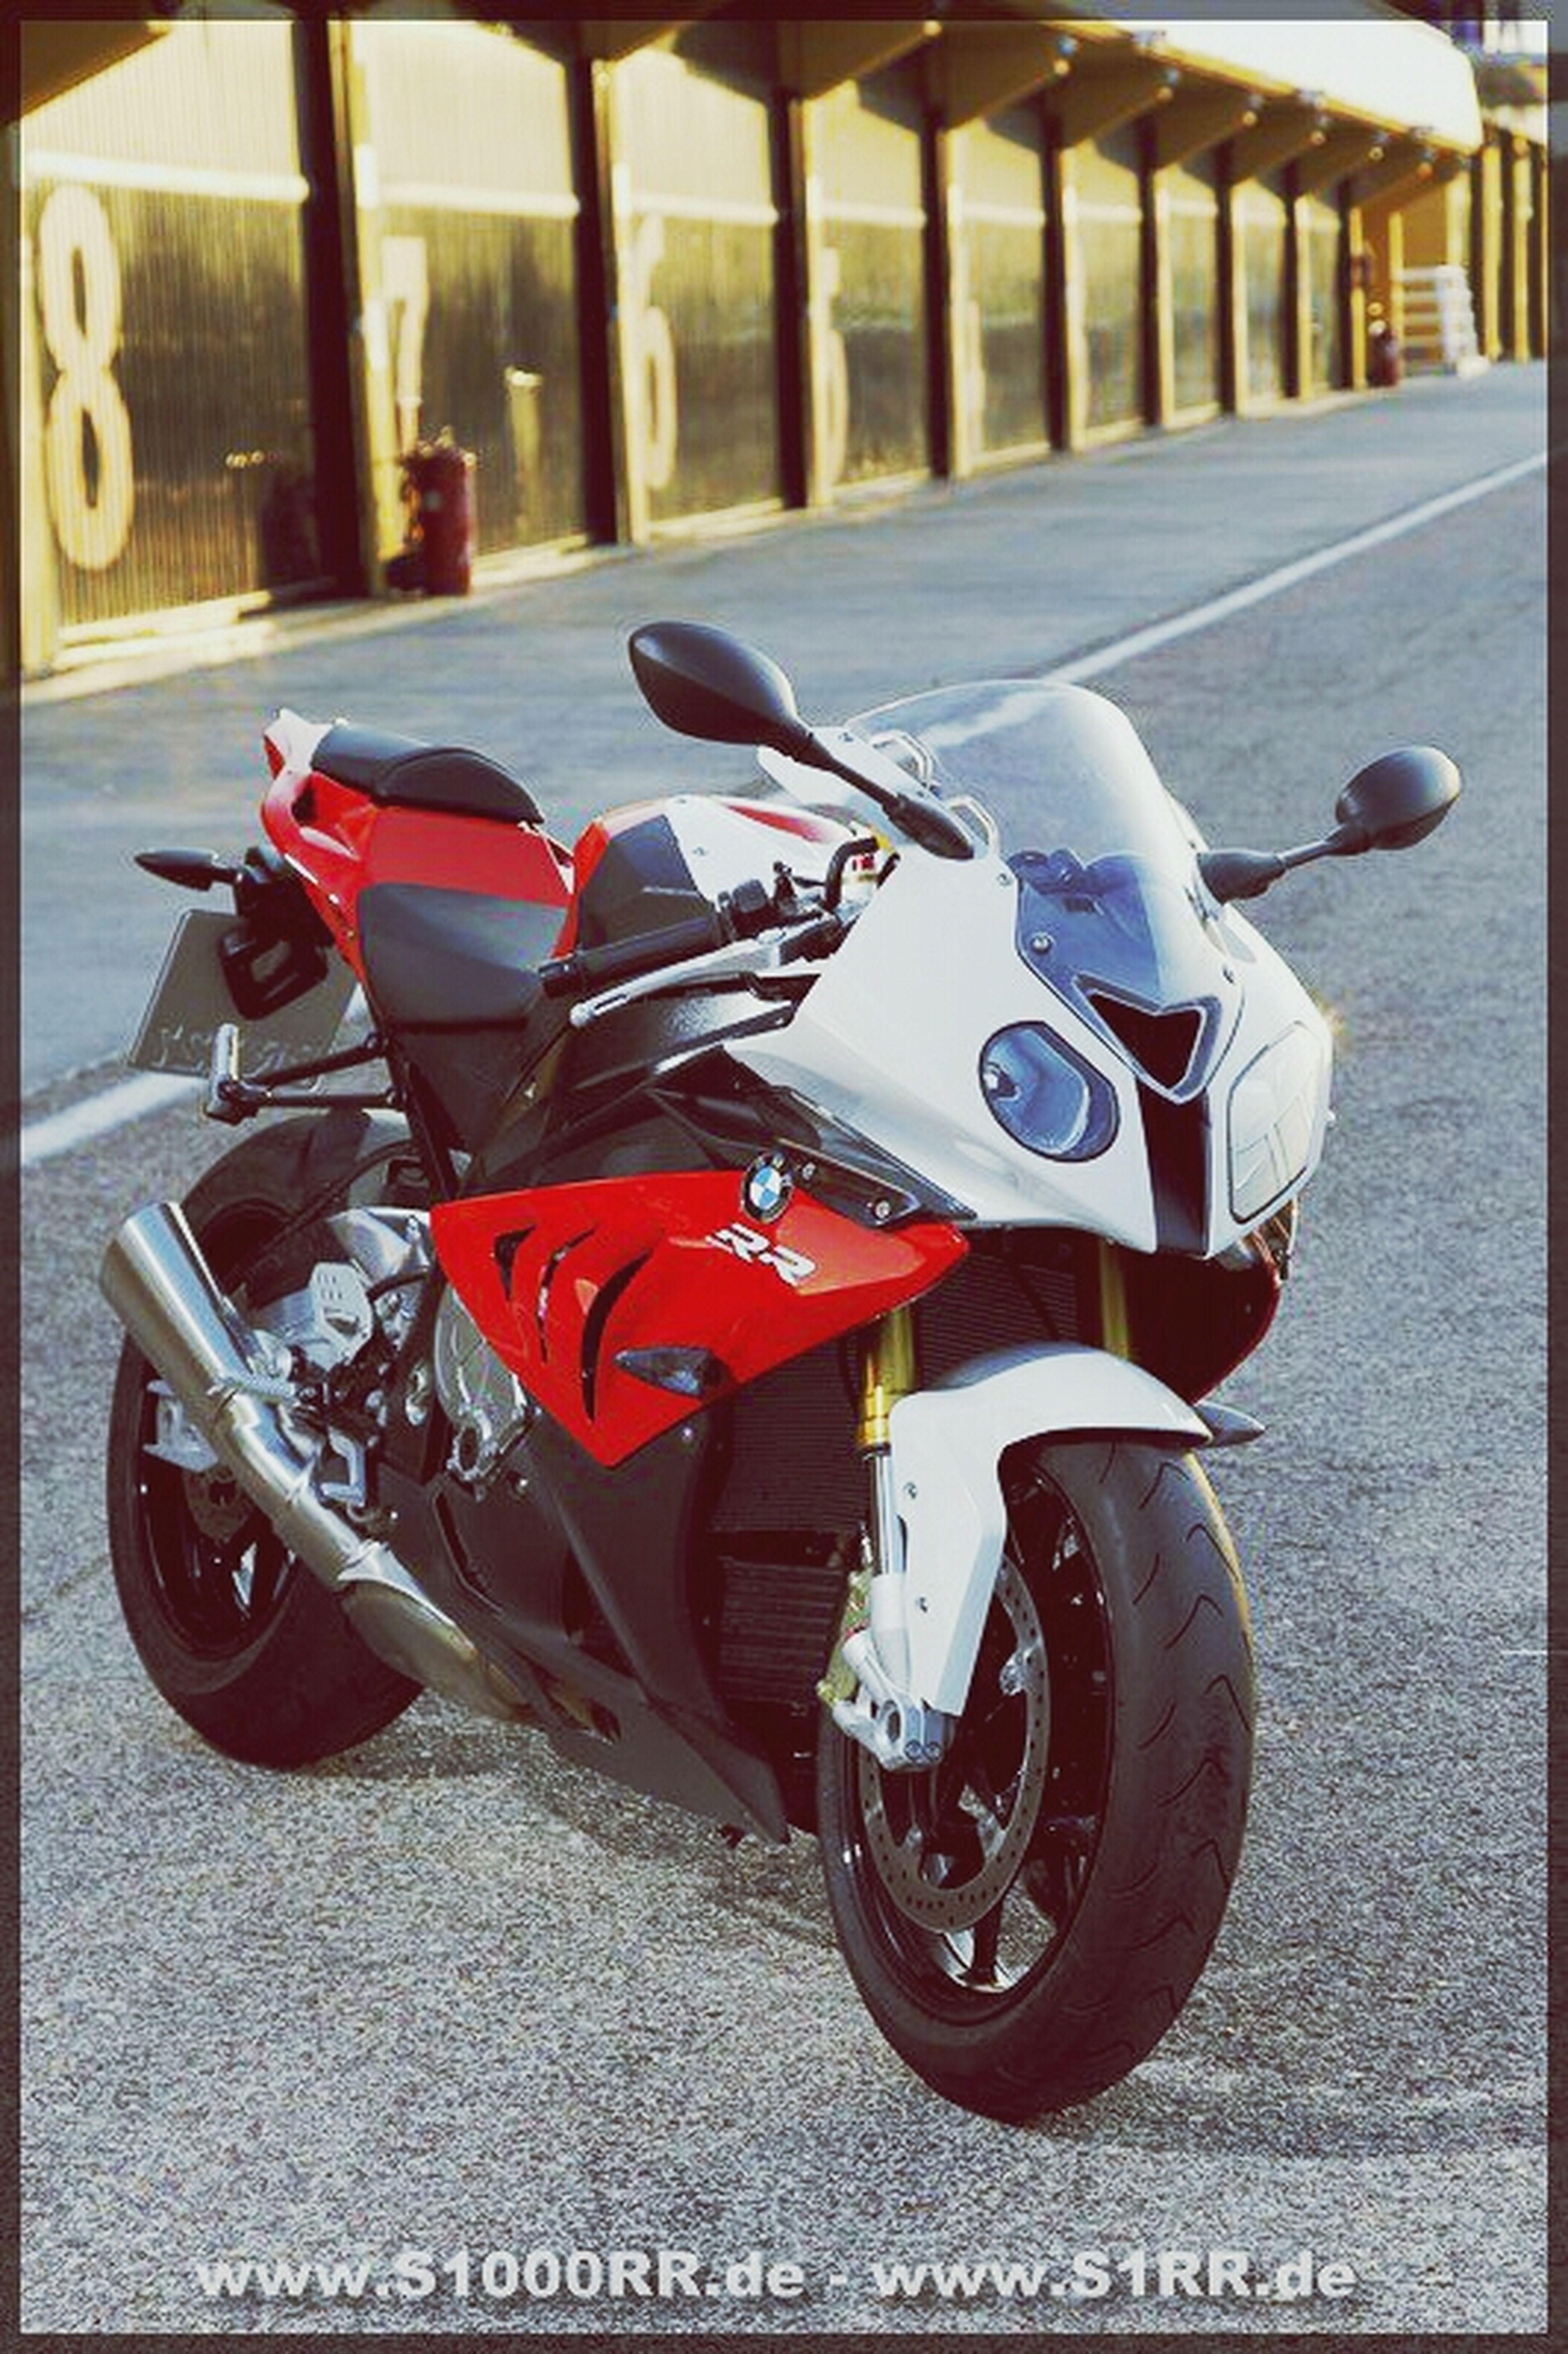 Taking Photos Hanging Out Motorbike 198ps